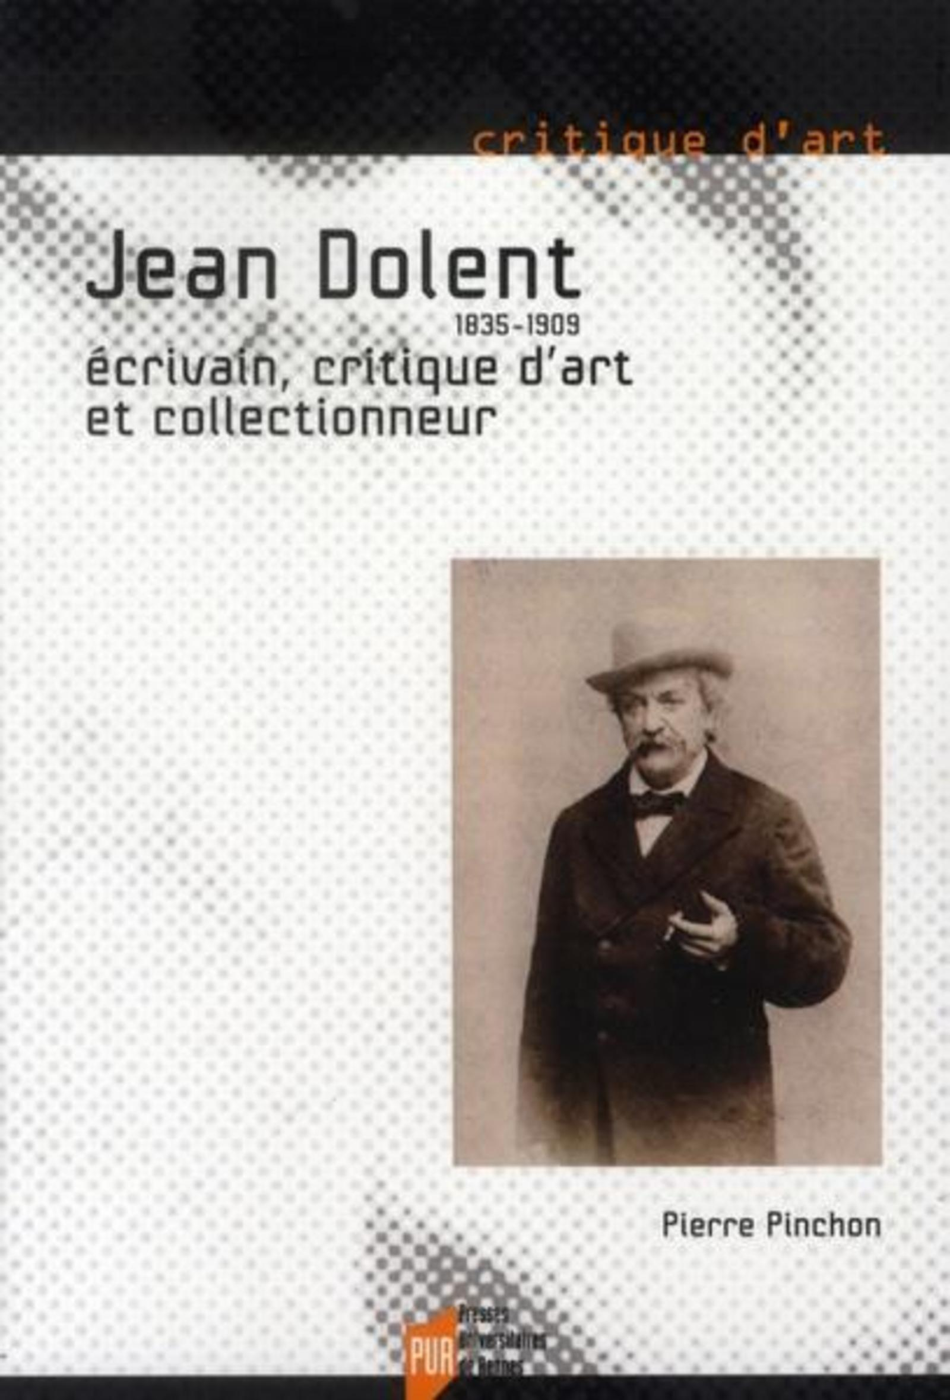 JEAN DOLENT